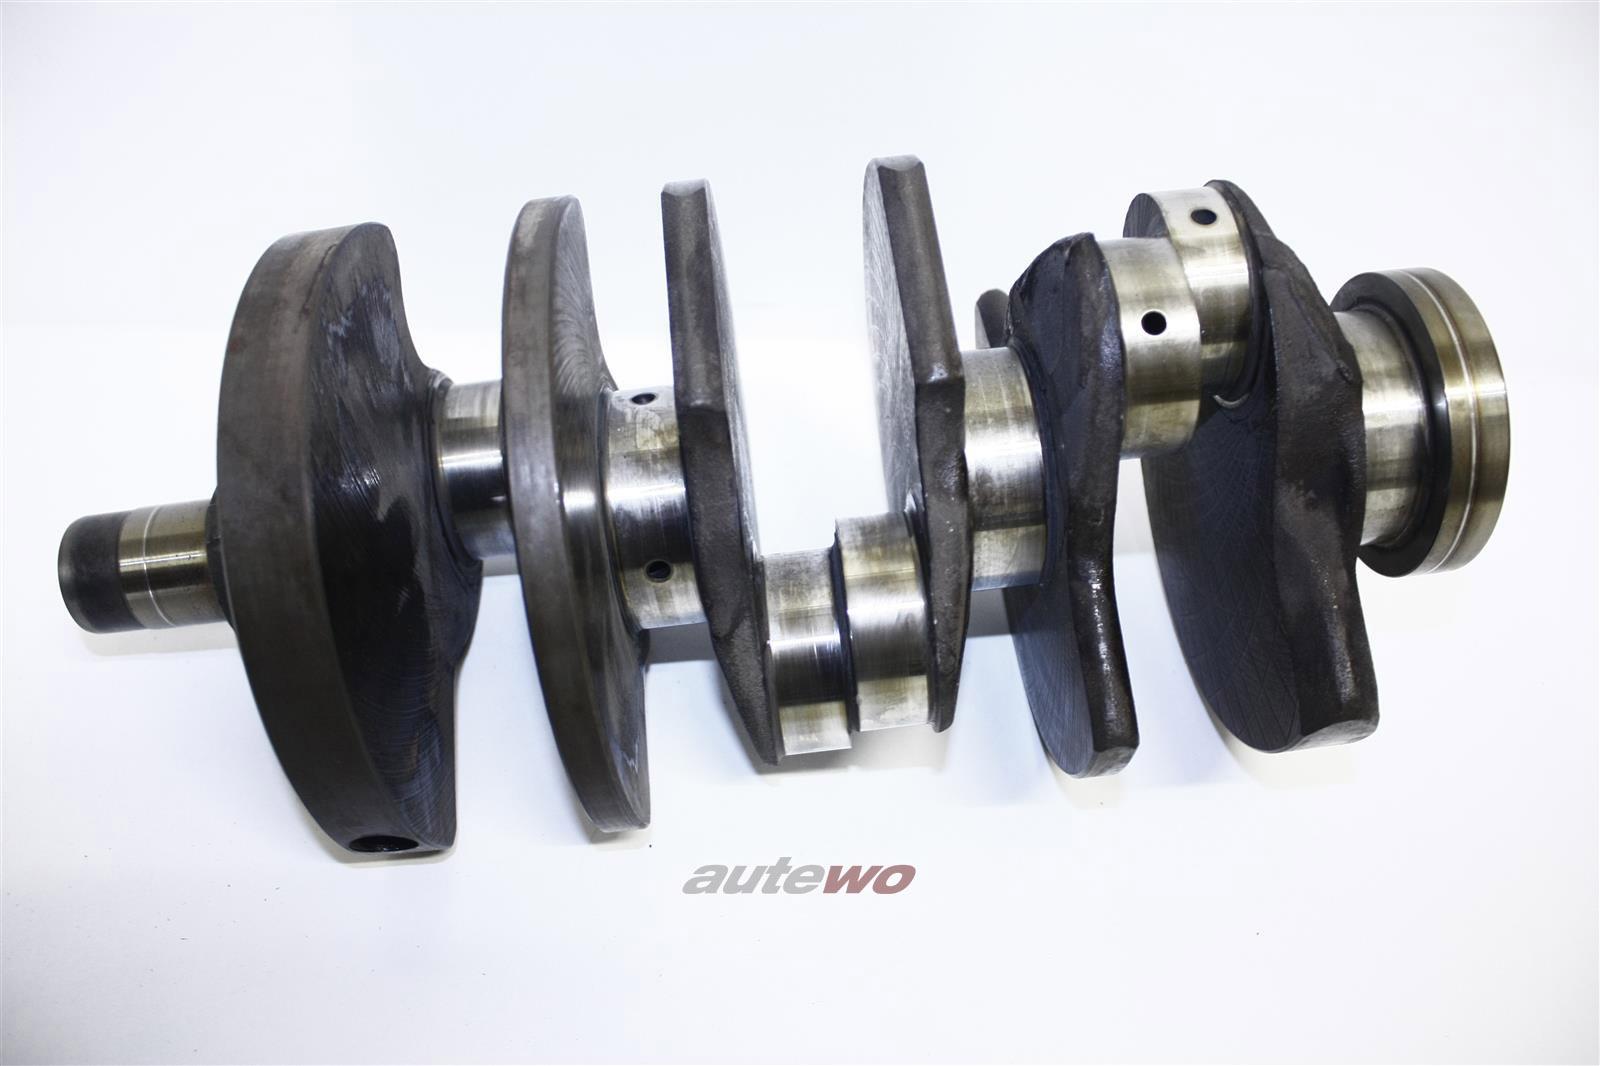 Audi 80/A4/A6 C4/A8 2.8l 174PS 6 Zylinder AAH Kurbelwelle 078105101AF 137000km